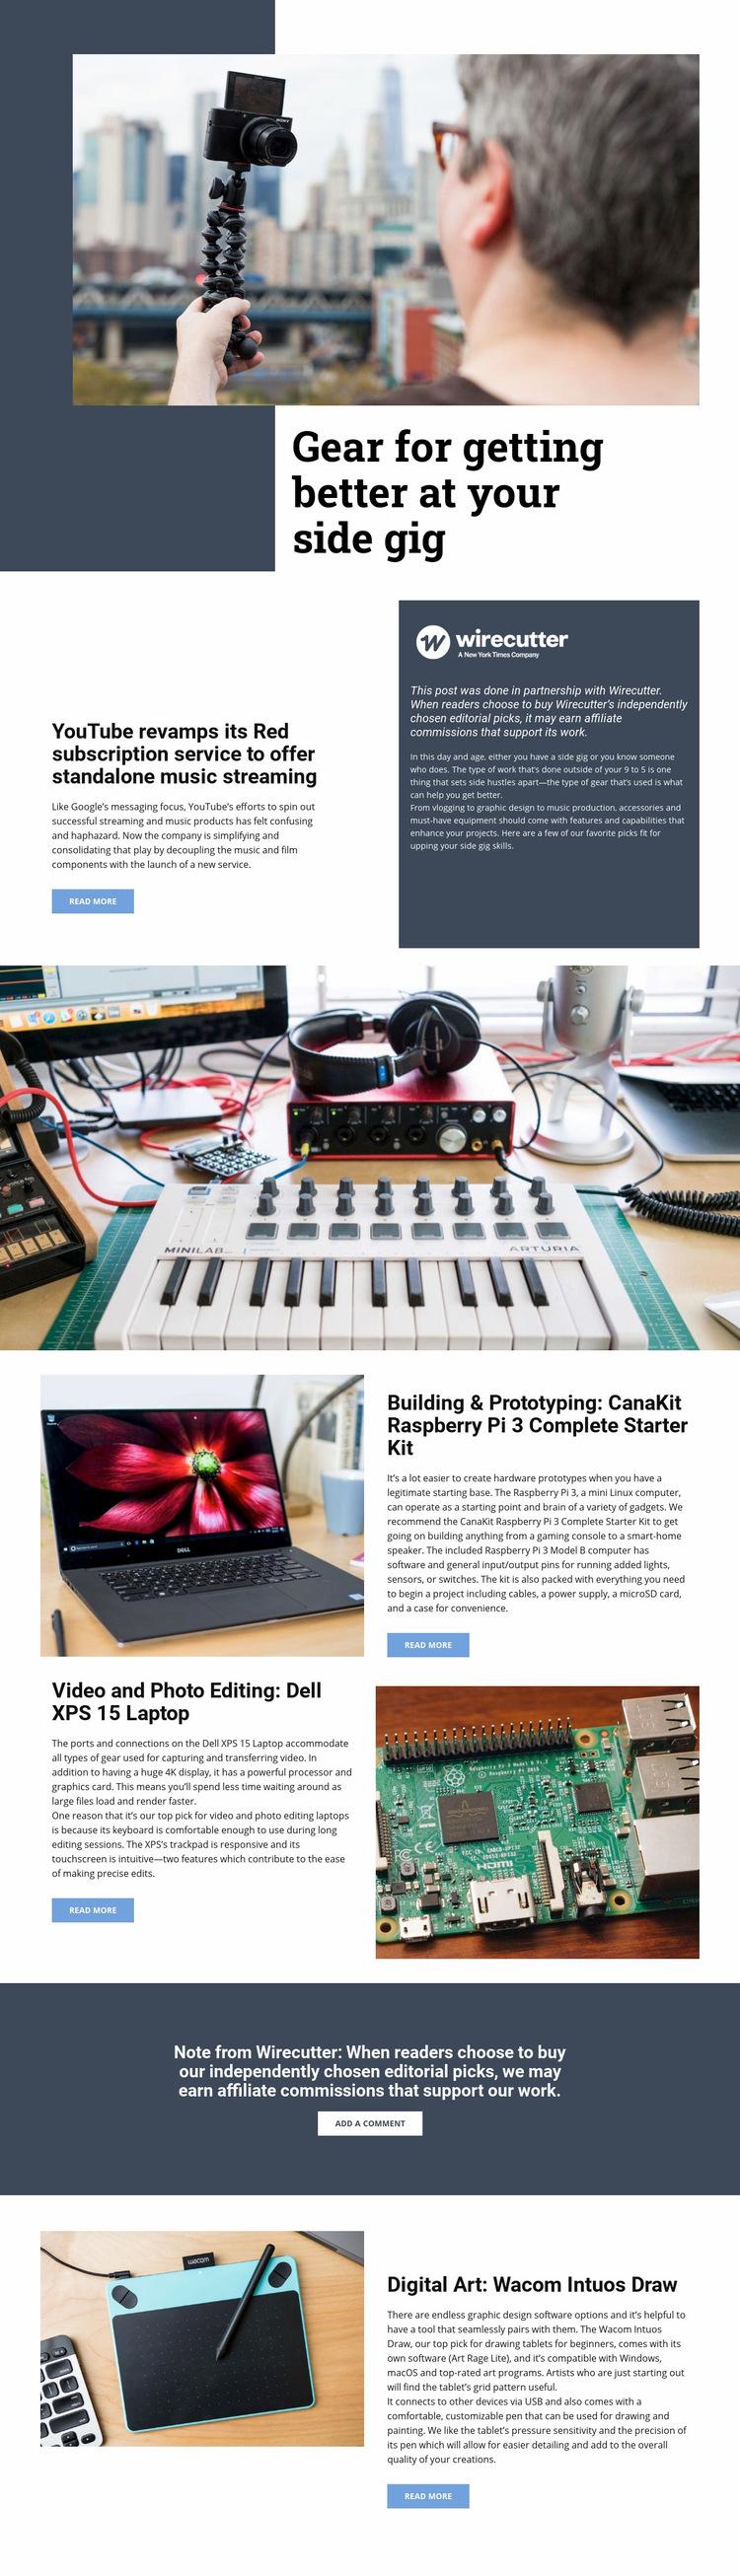 Video Technology Web Page Design